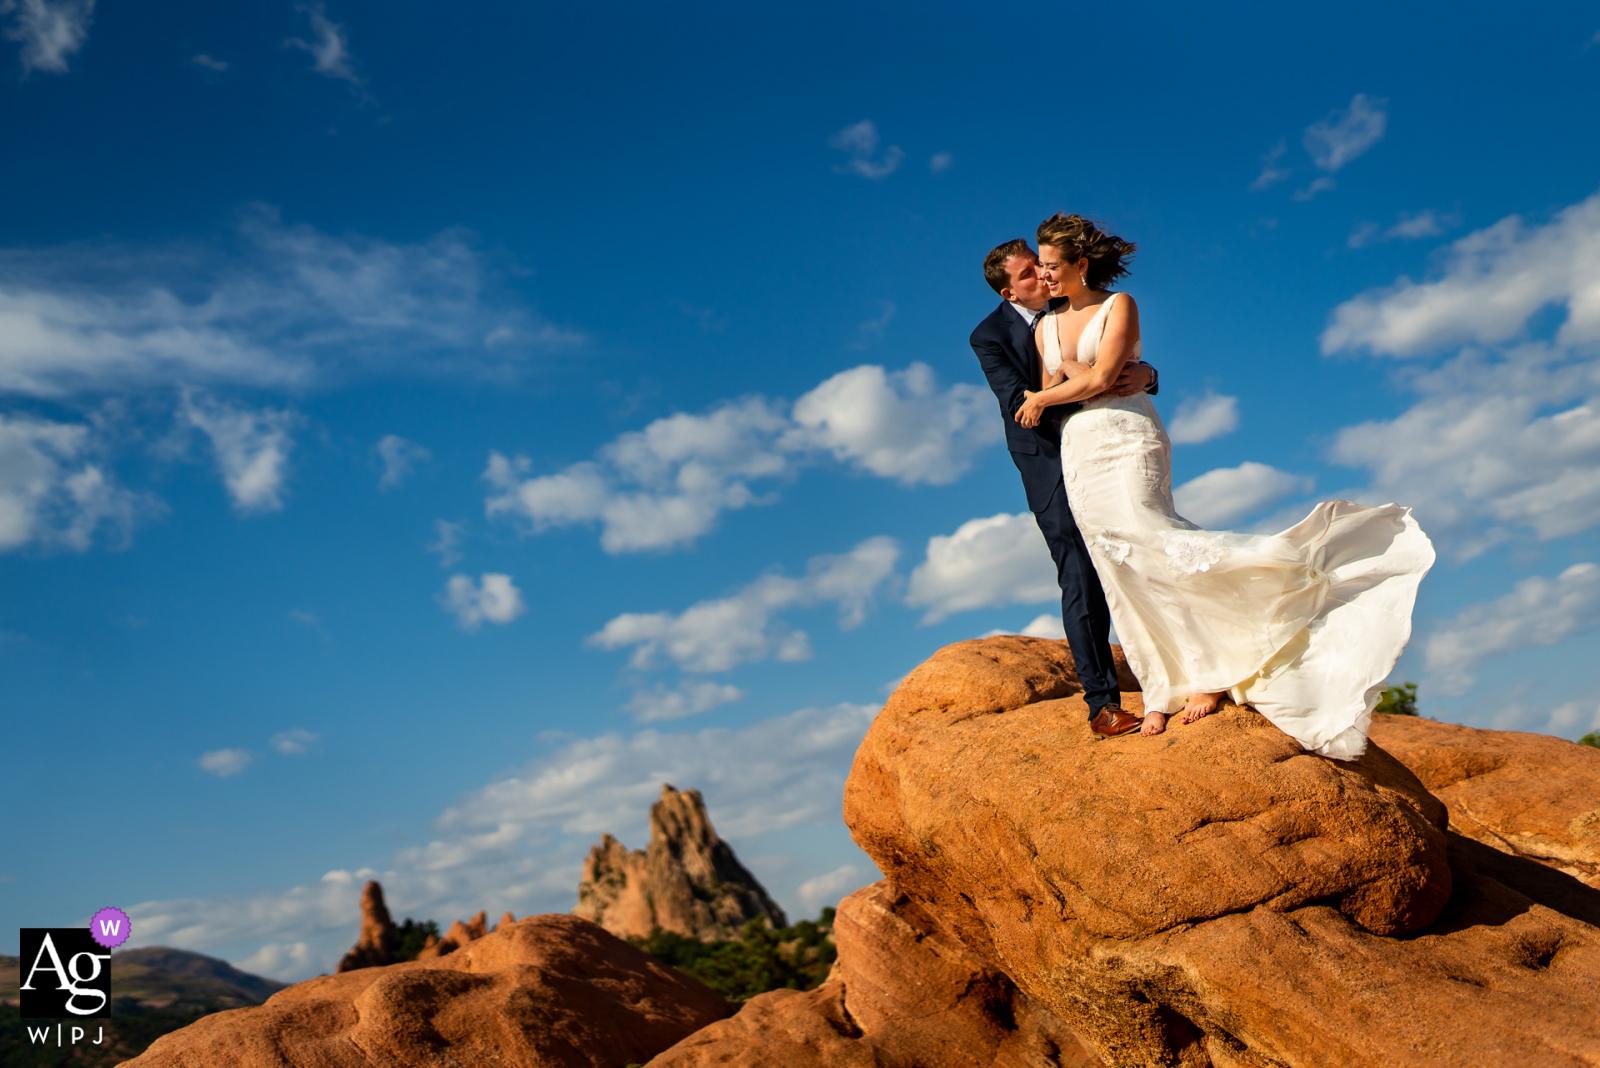 Artistic wedding photo from Garden of the Gods Park - Colorado Springs, Colorado during portraits on their wedding day